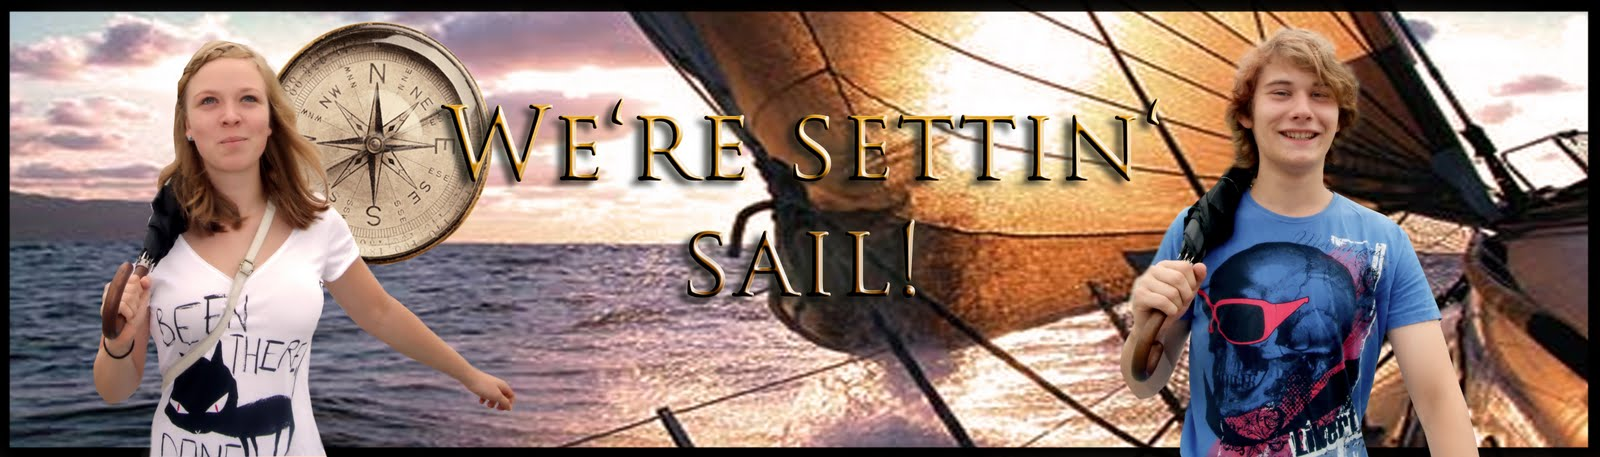 We're settin' sail!